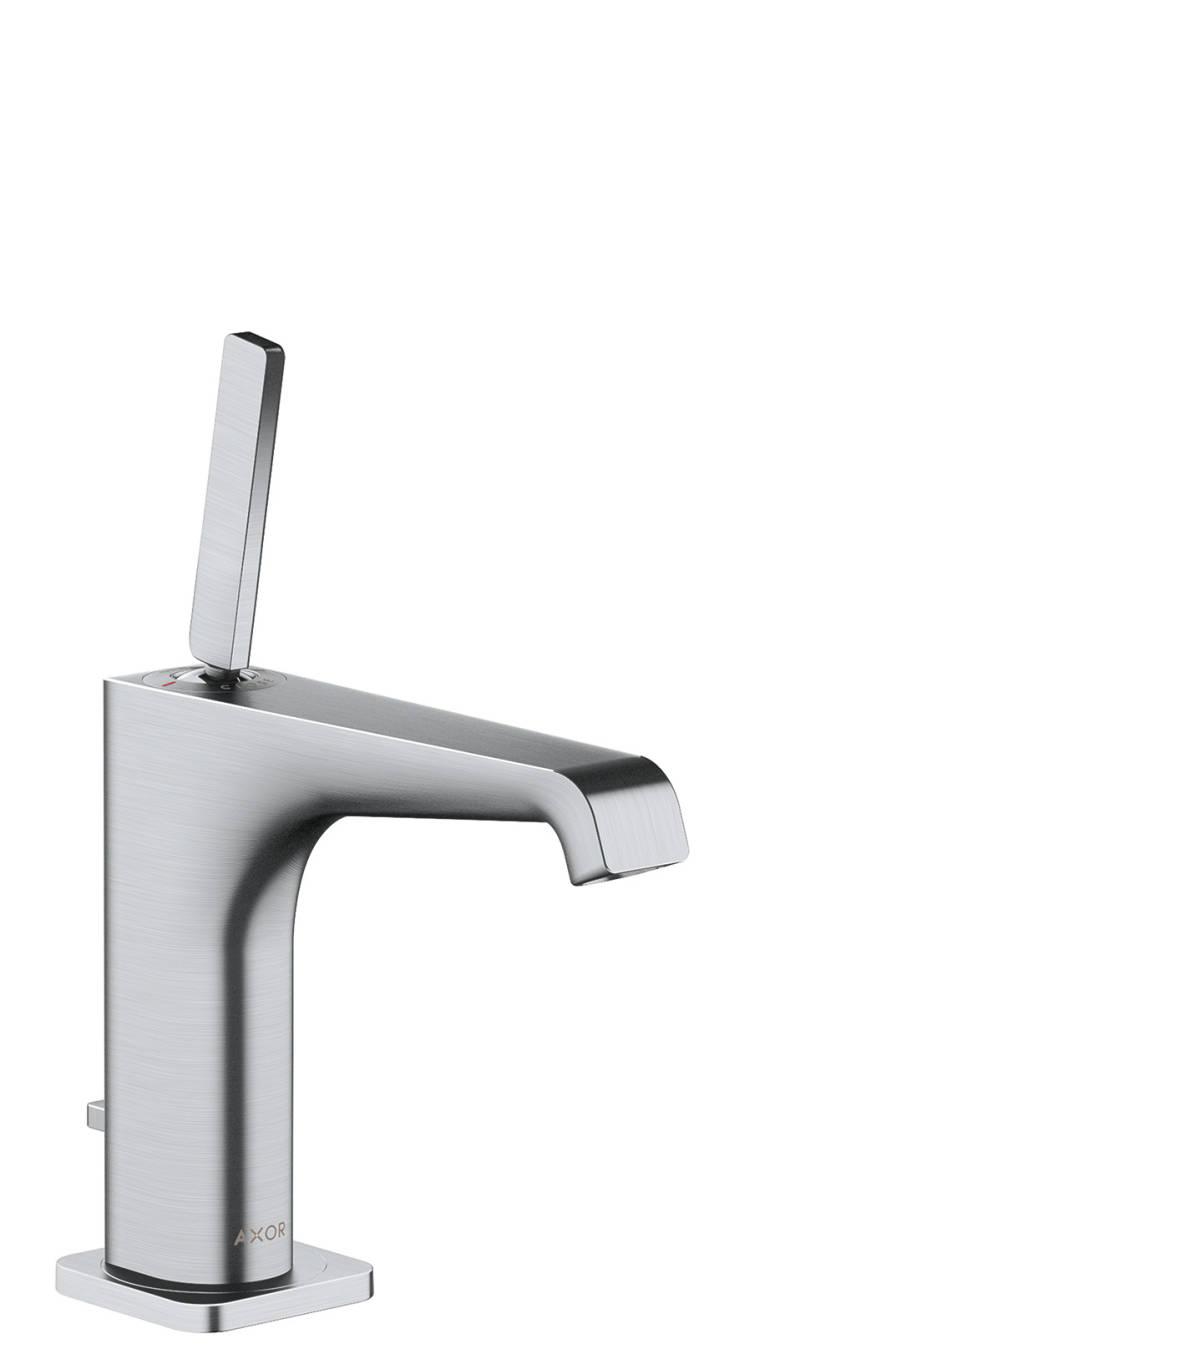 Single lever basin mixer 130 with pop-up waste set, Brushed Chrome, 36100260